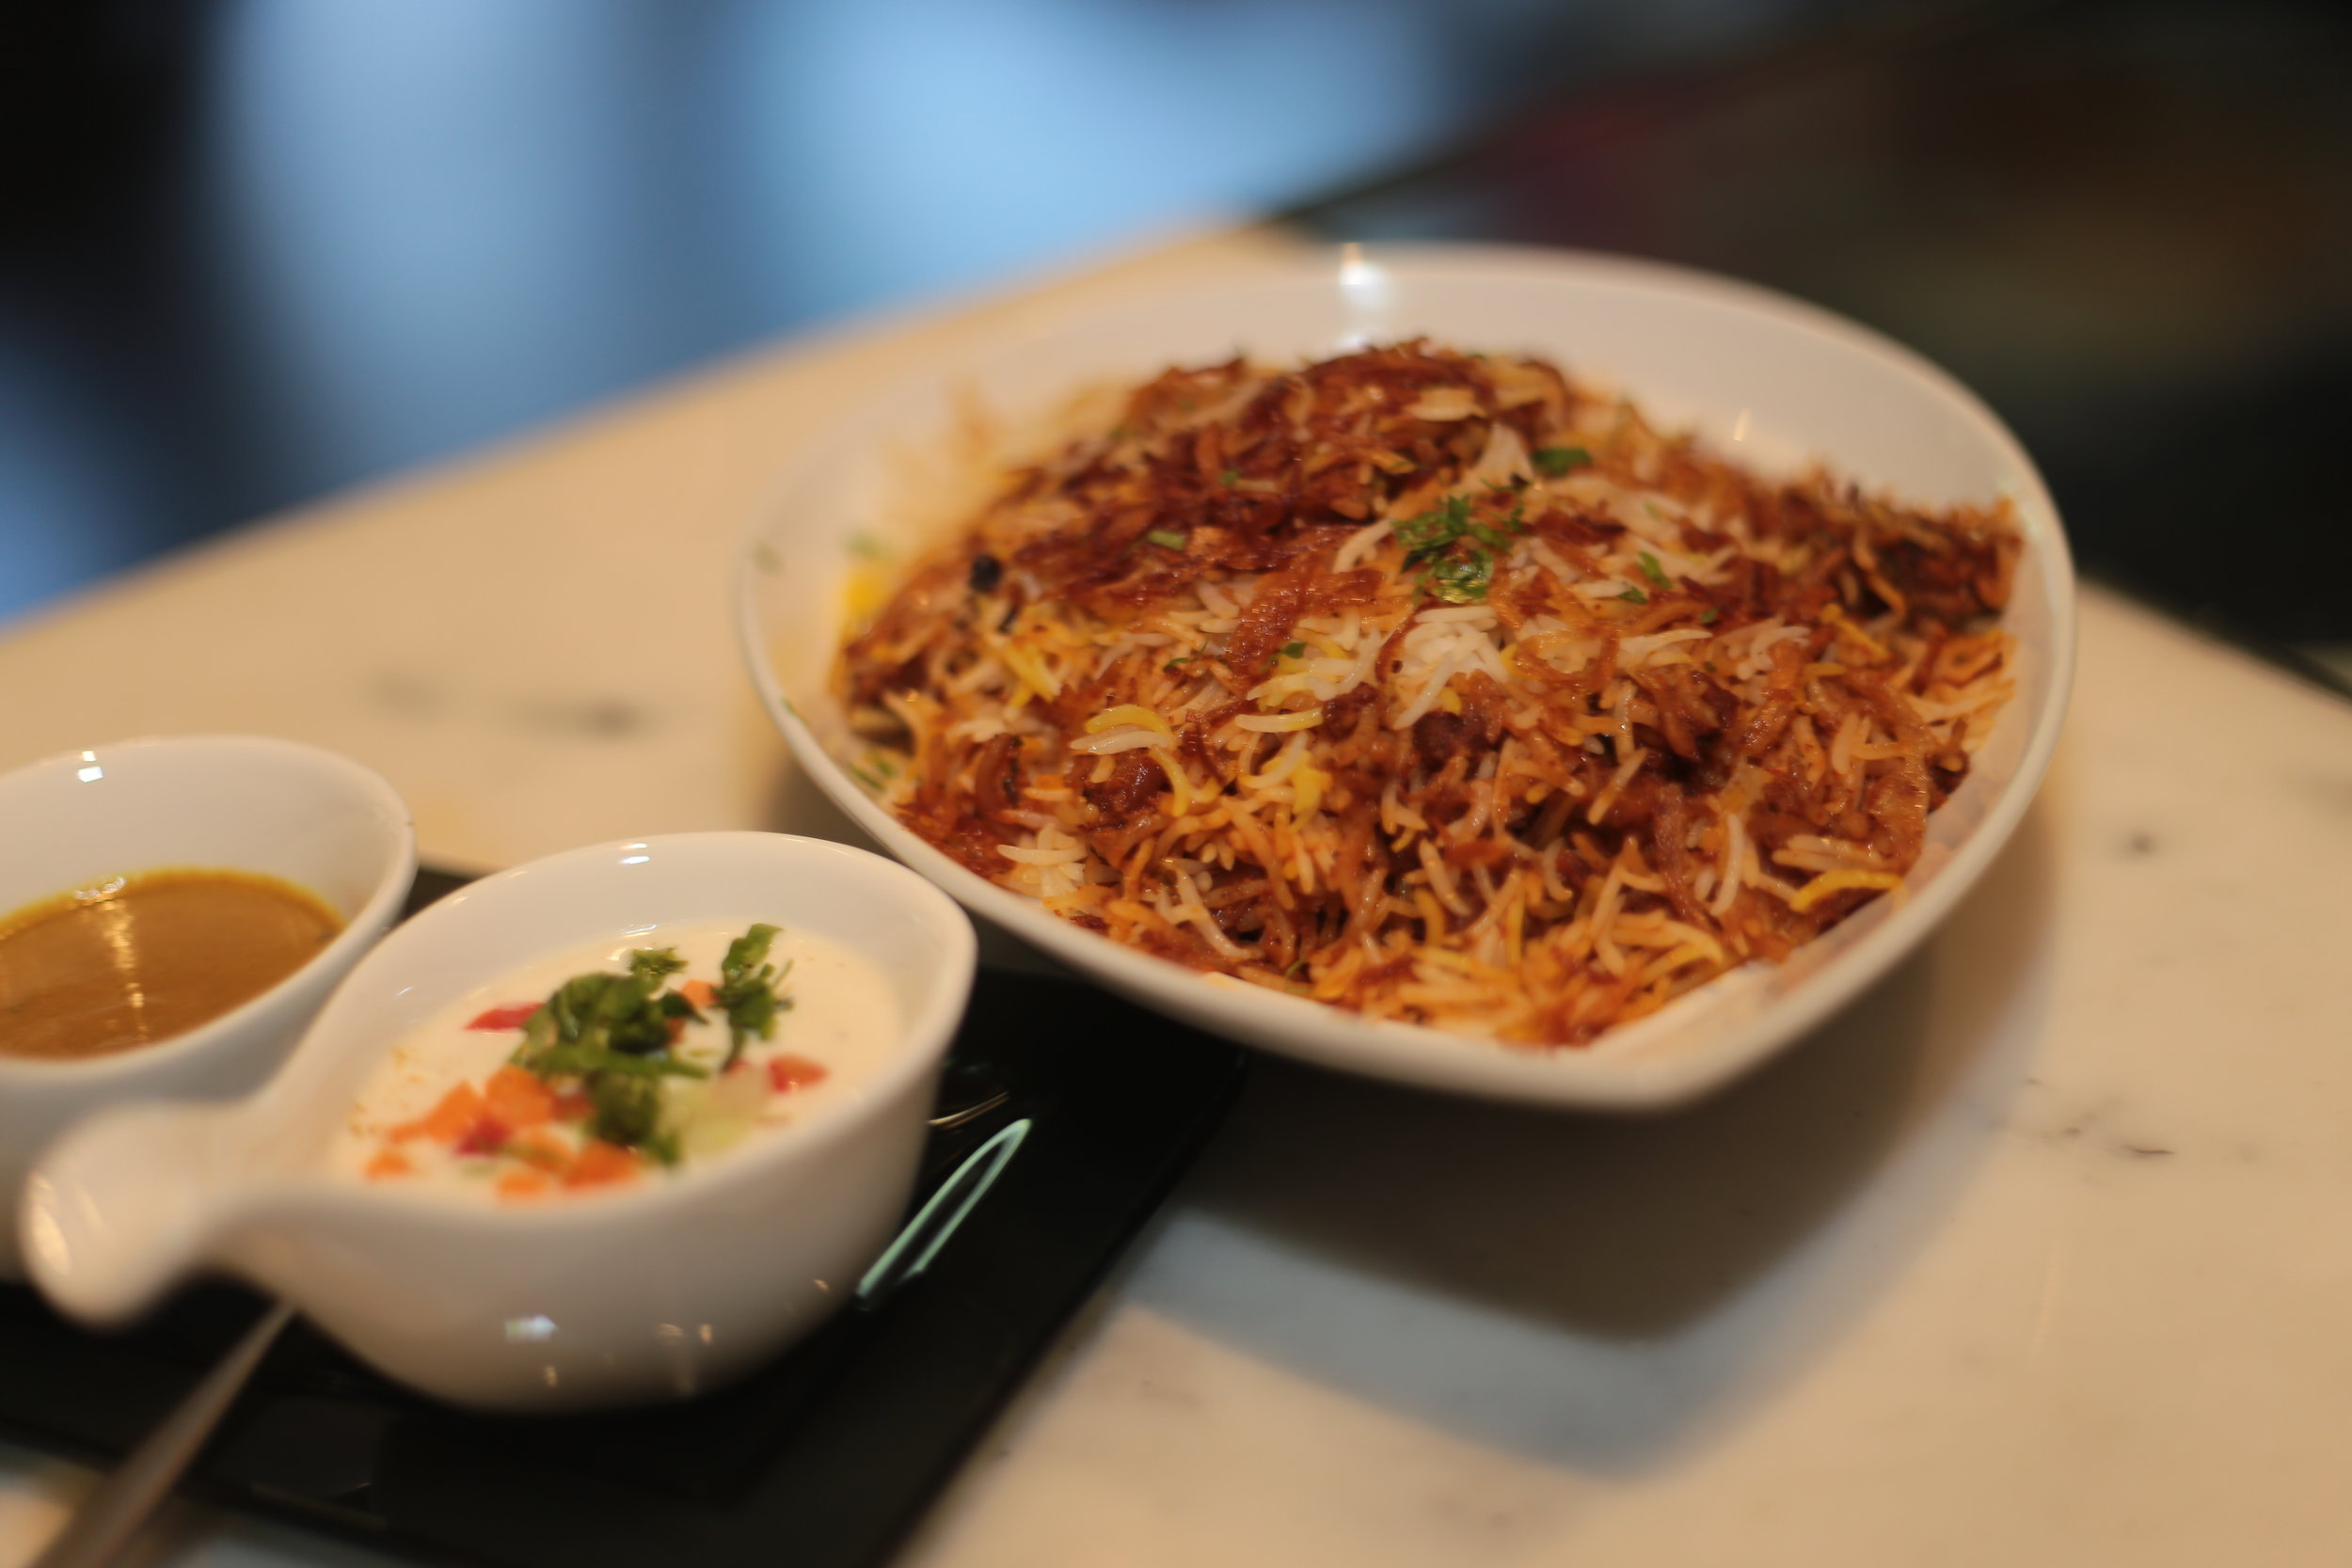 Kache Gosht ki biryani served with Baingan Salan and raita